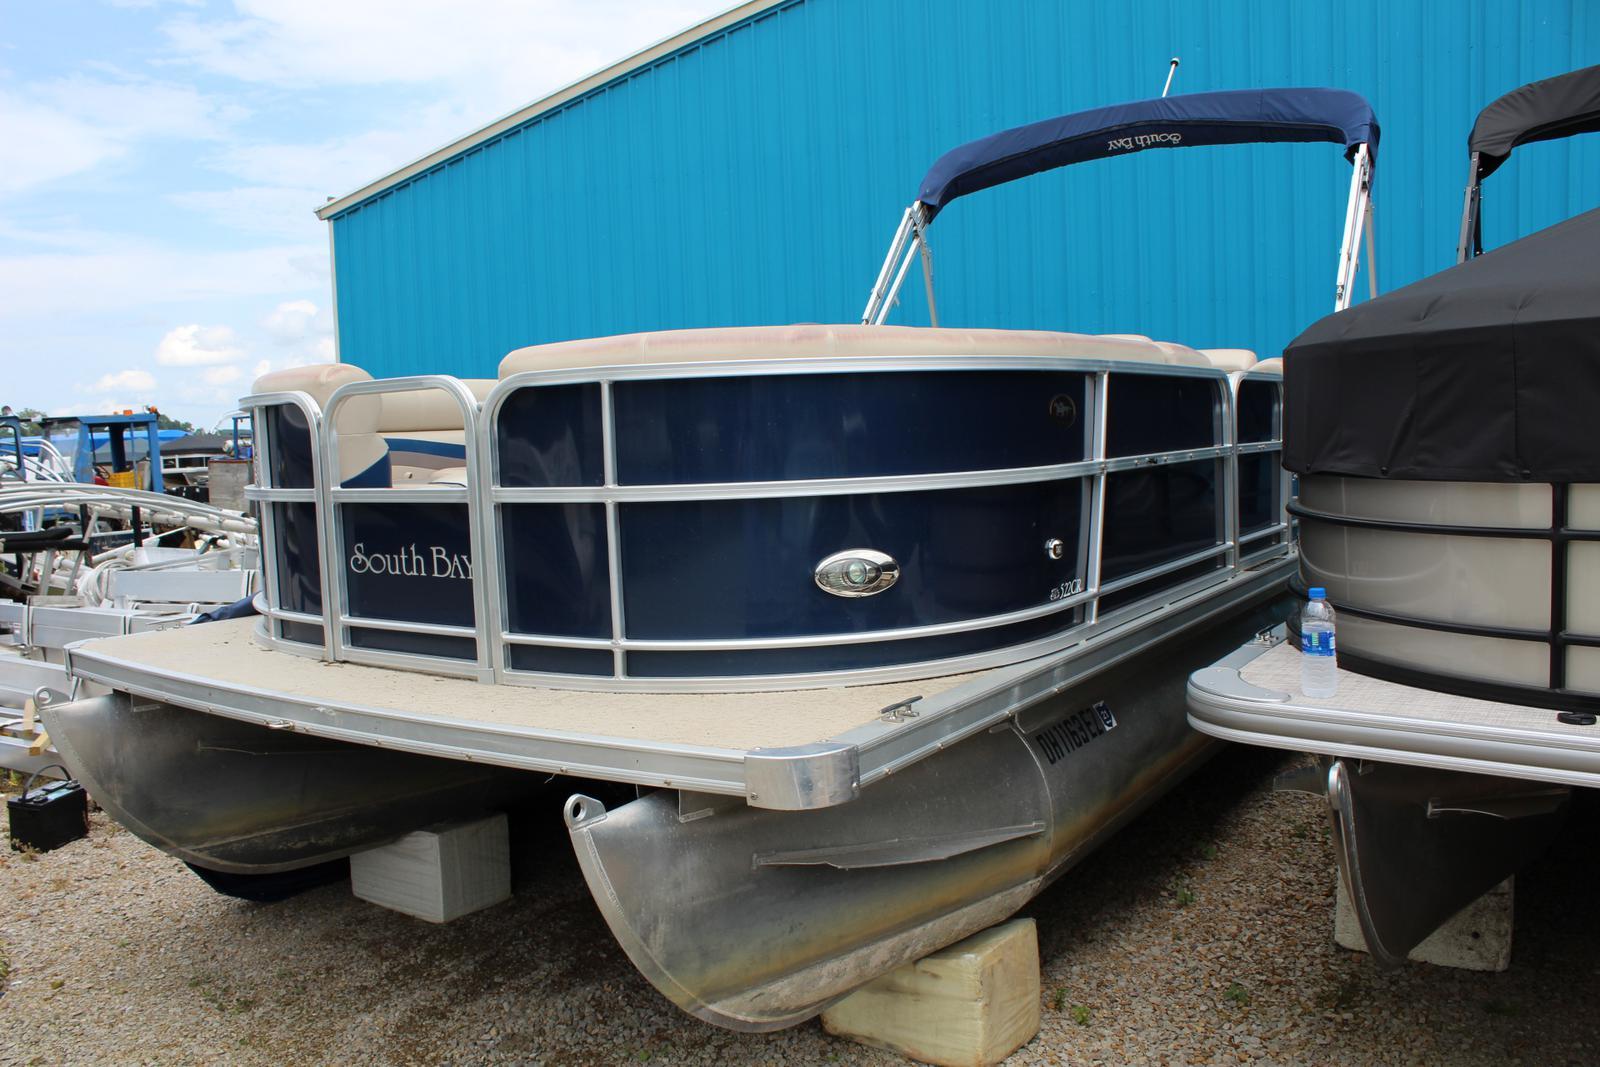 Inventory Buckeye Lake Marina Millersport, OH (740) 467-2697